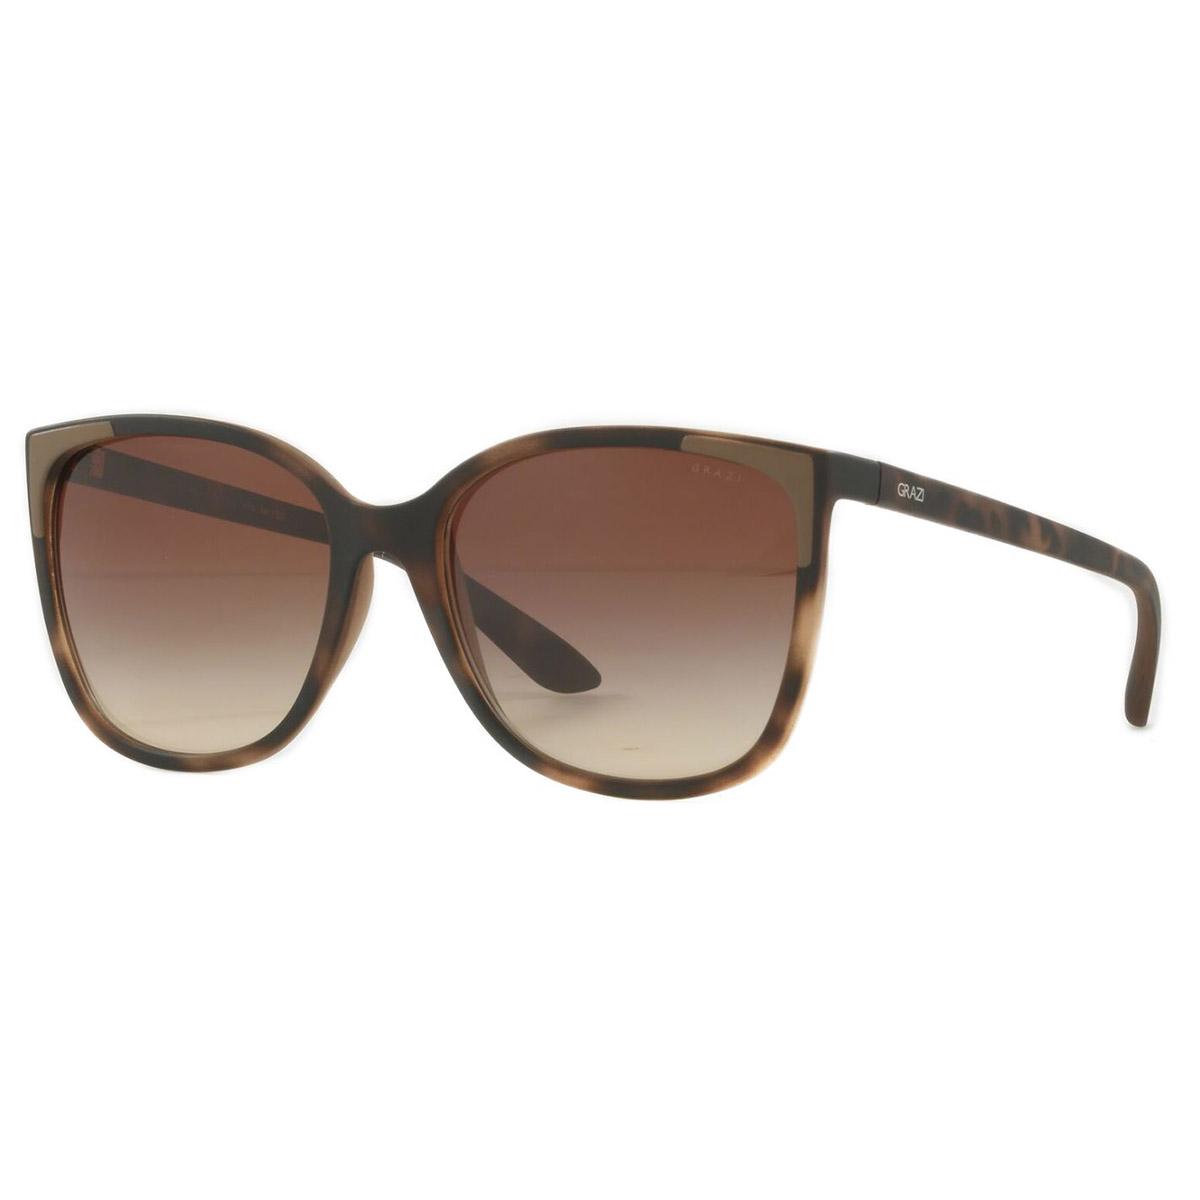 Óculos de Sol Grazi Massafera GZ4032 Marrom Havana Fosco